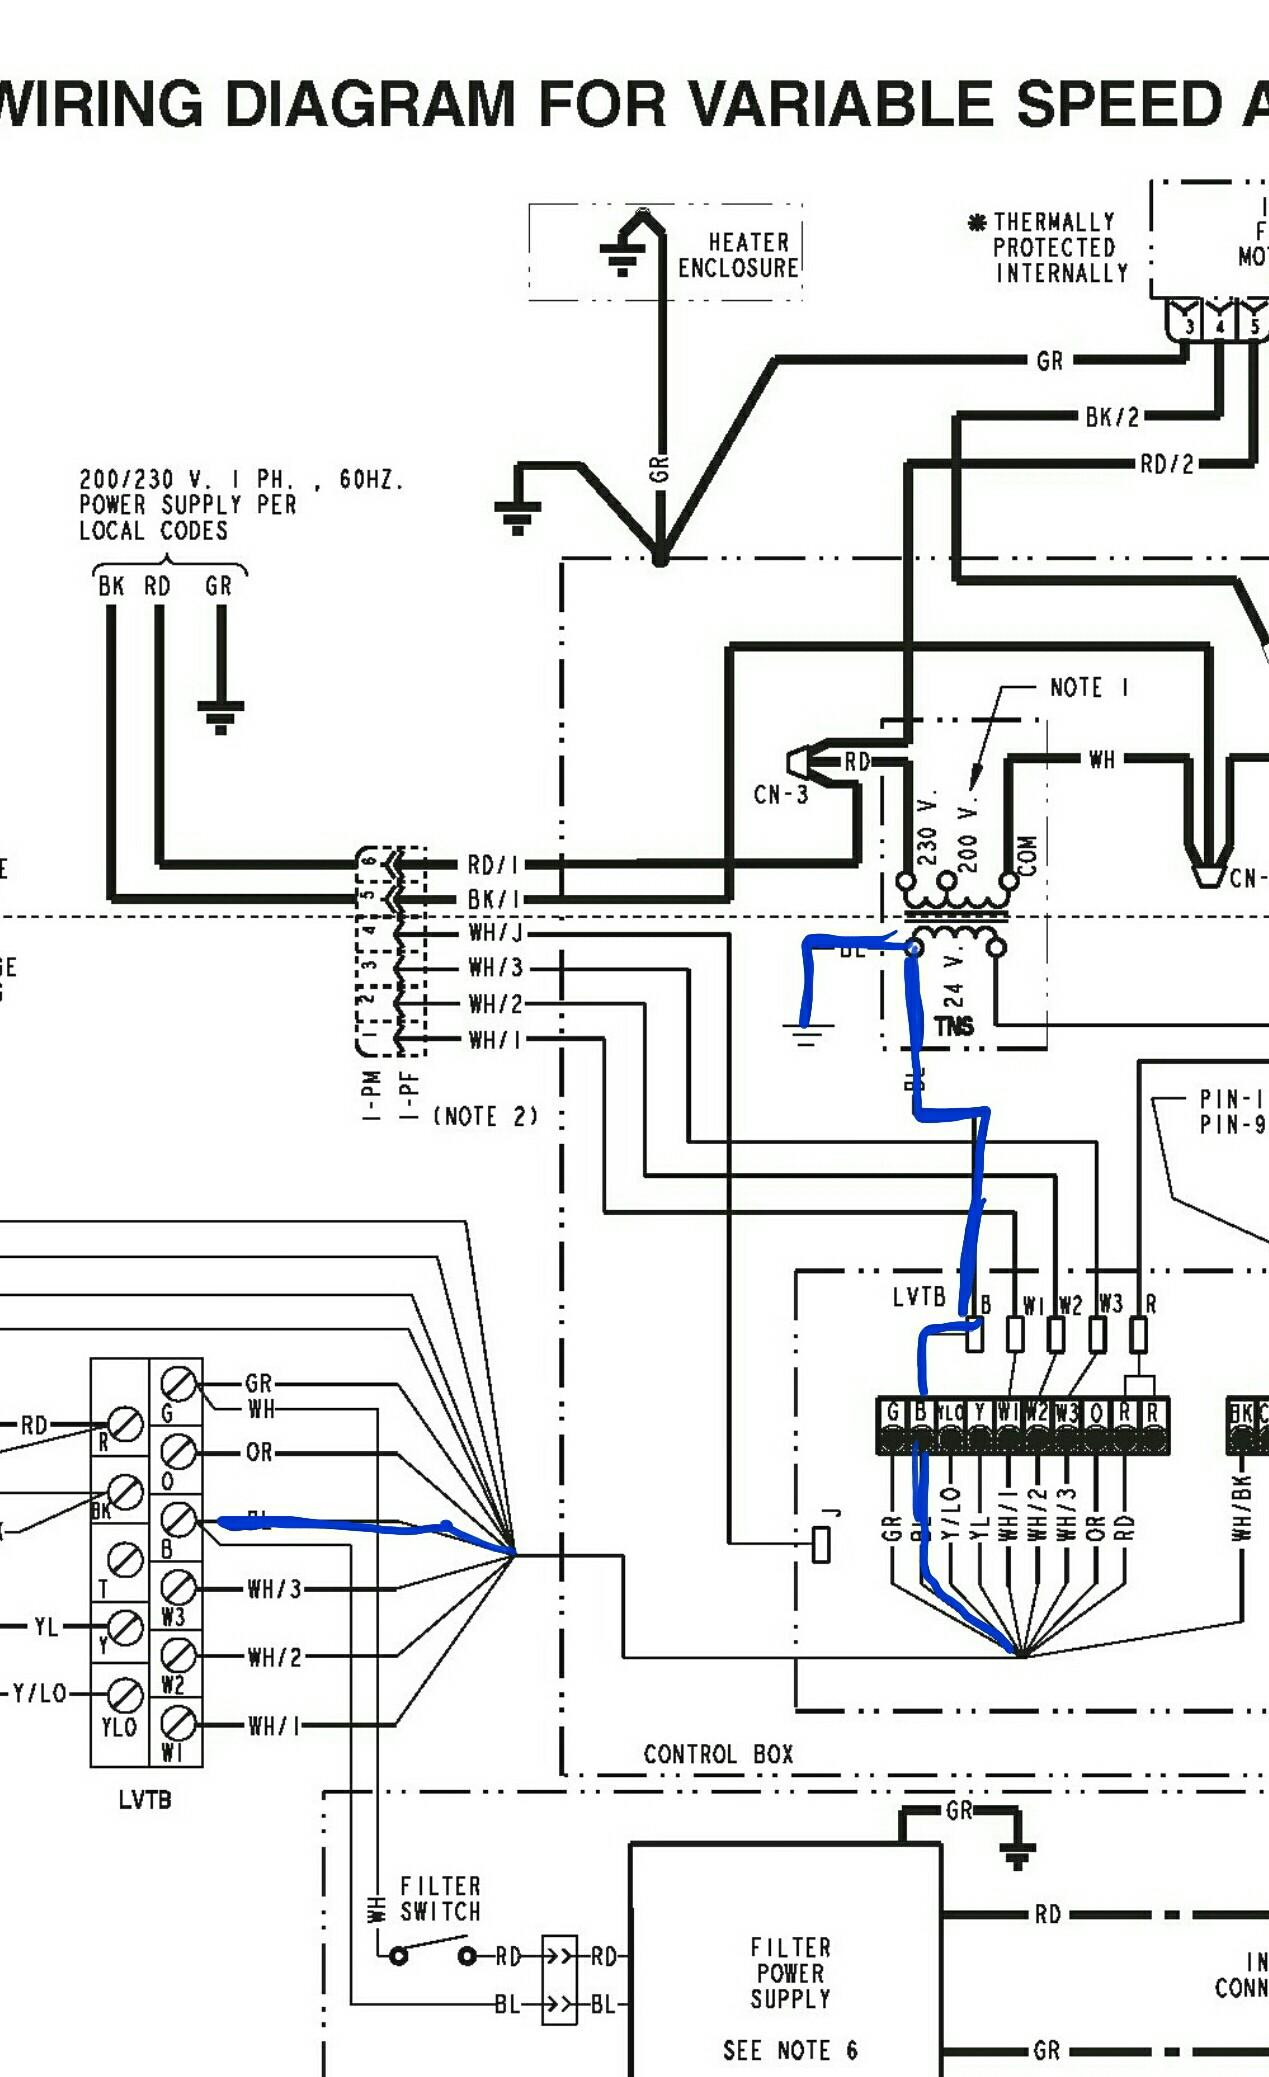 trane air handler wiring diagram club car gas electrical c wire missing variable